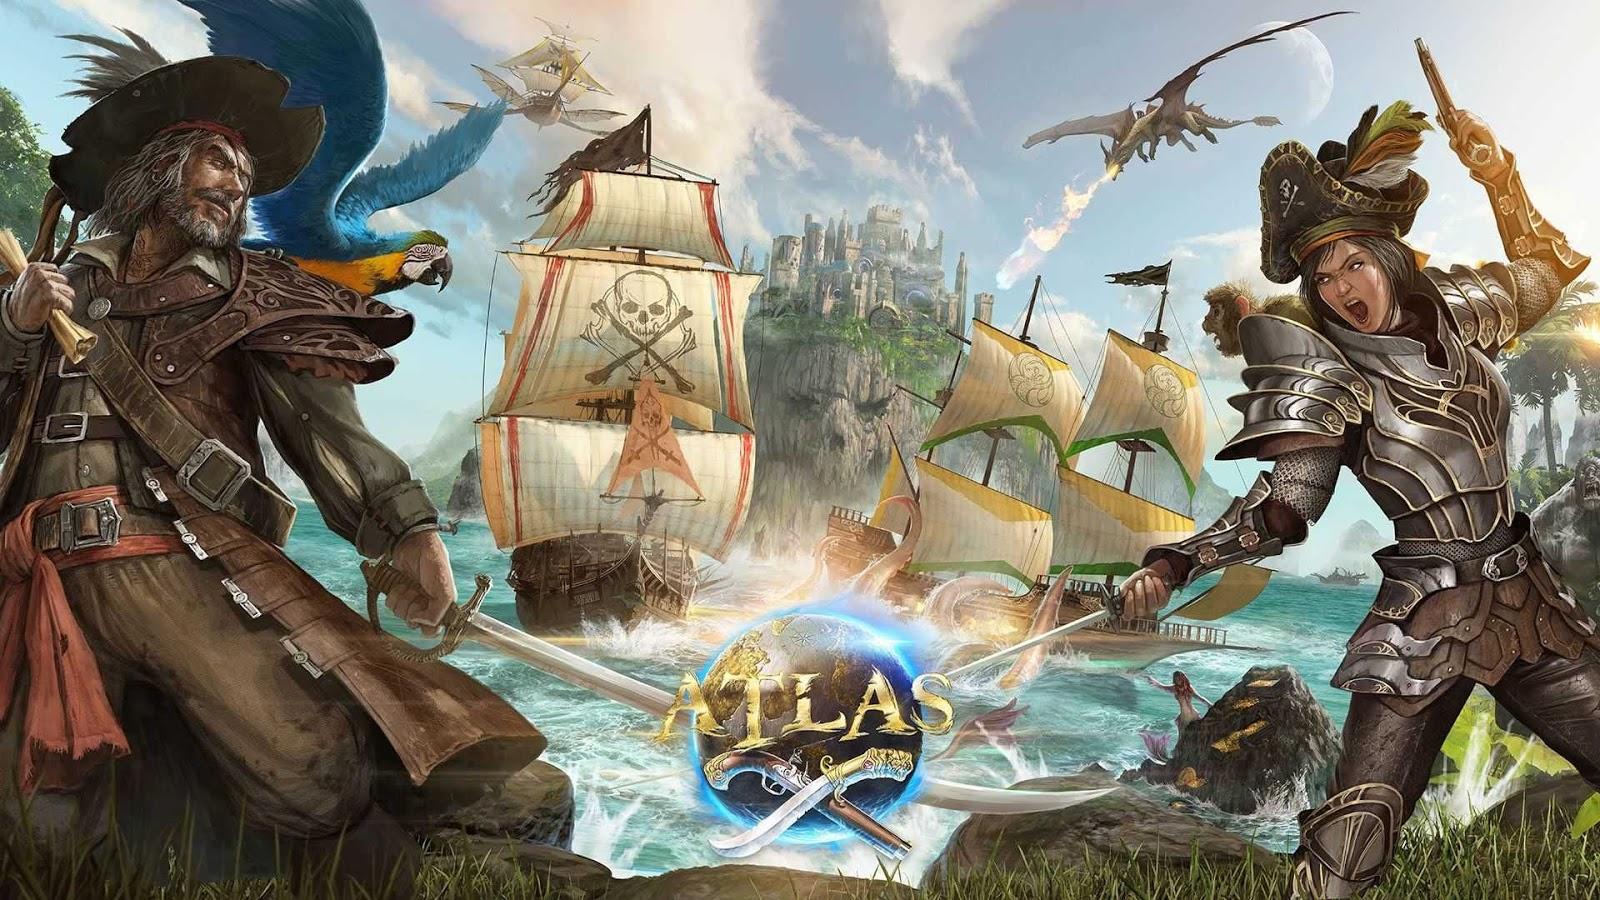 atlas-onine-multiplayer-auto-update